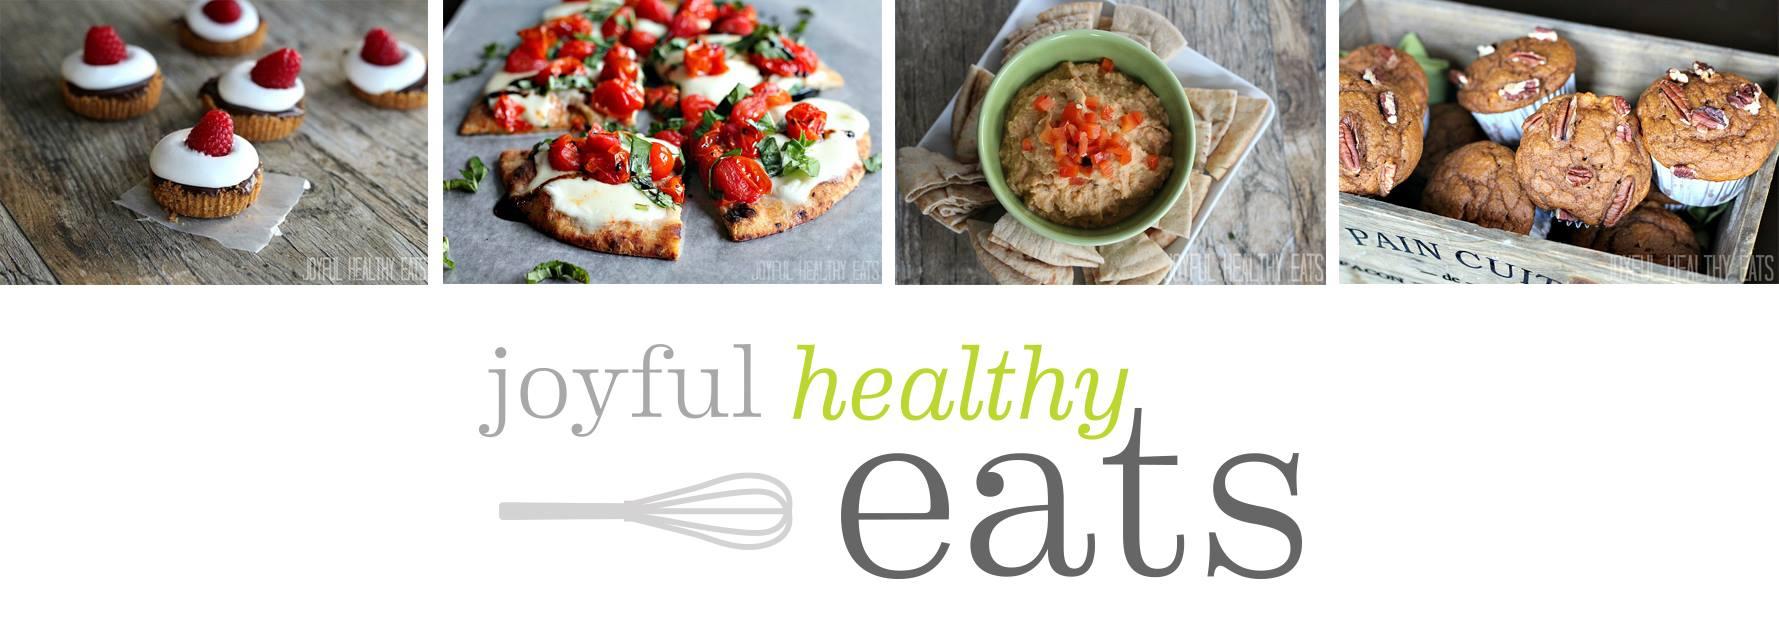 photos of food recipes for joyful healthy